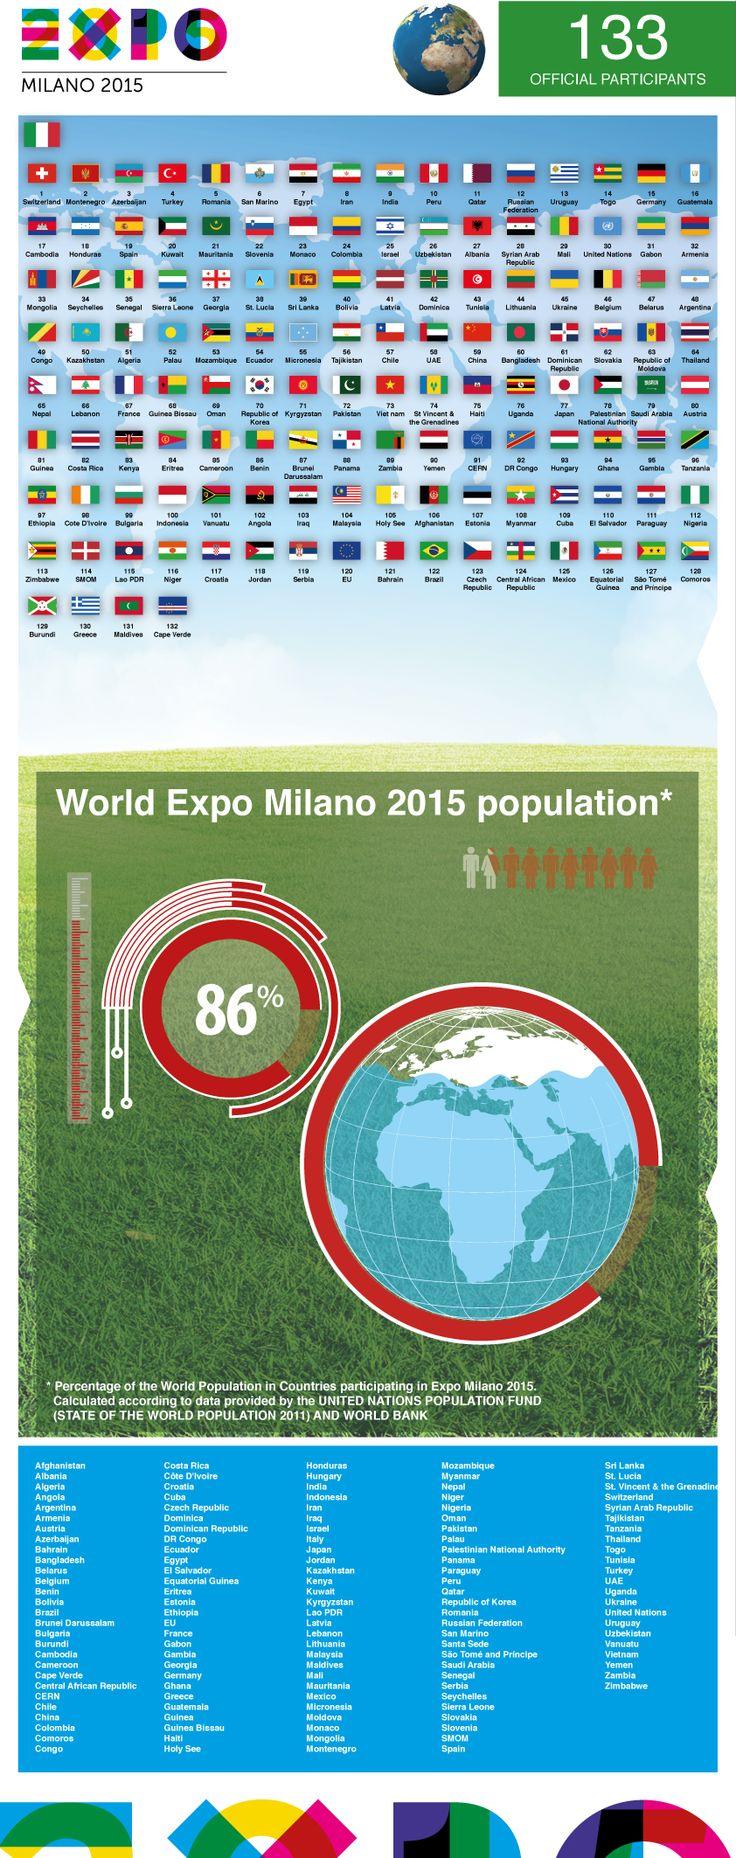 World Expo Milano 2015 population